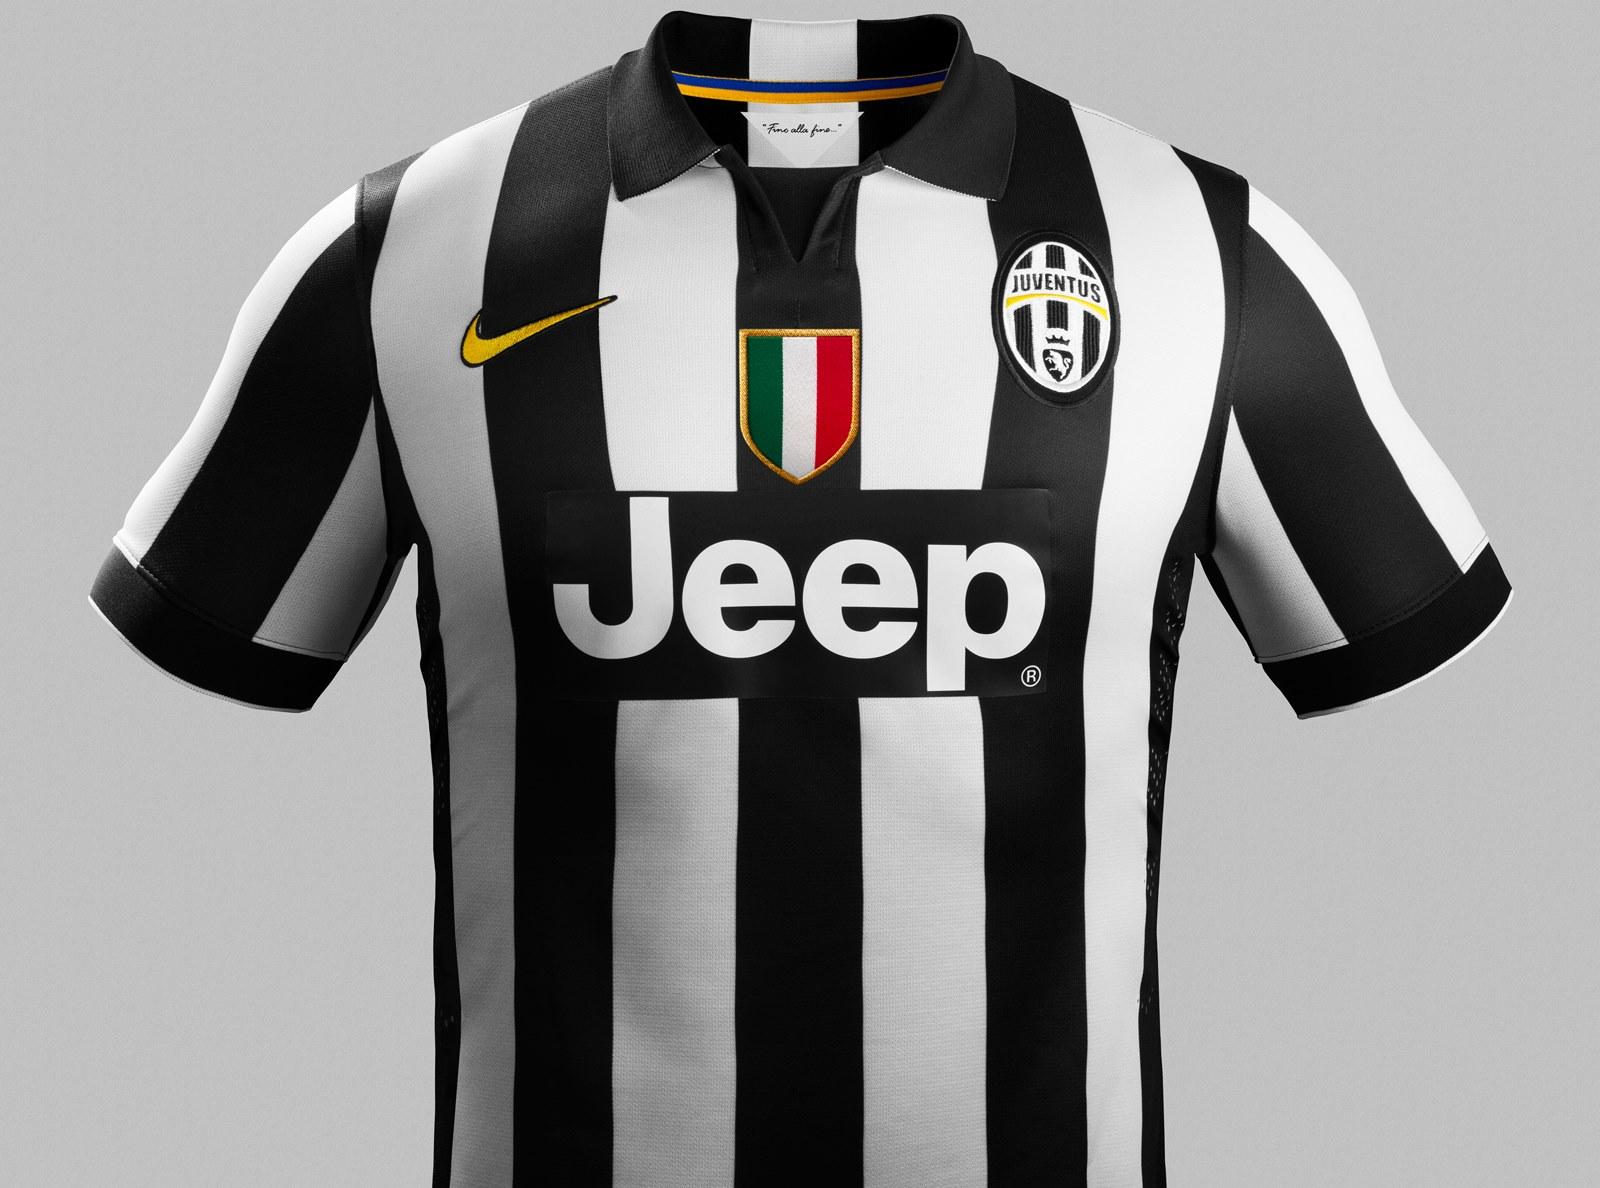 Neue Juventus 14-15 Trikots - Nur Fussball